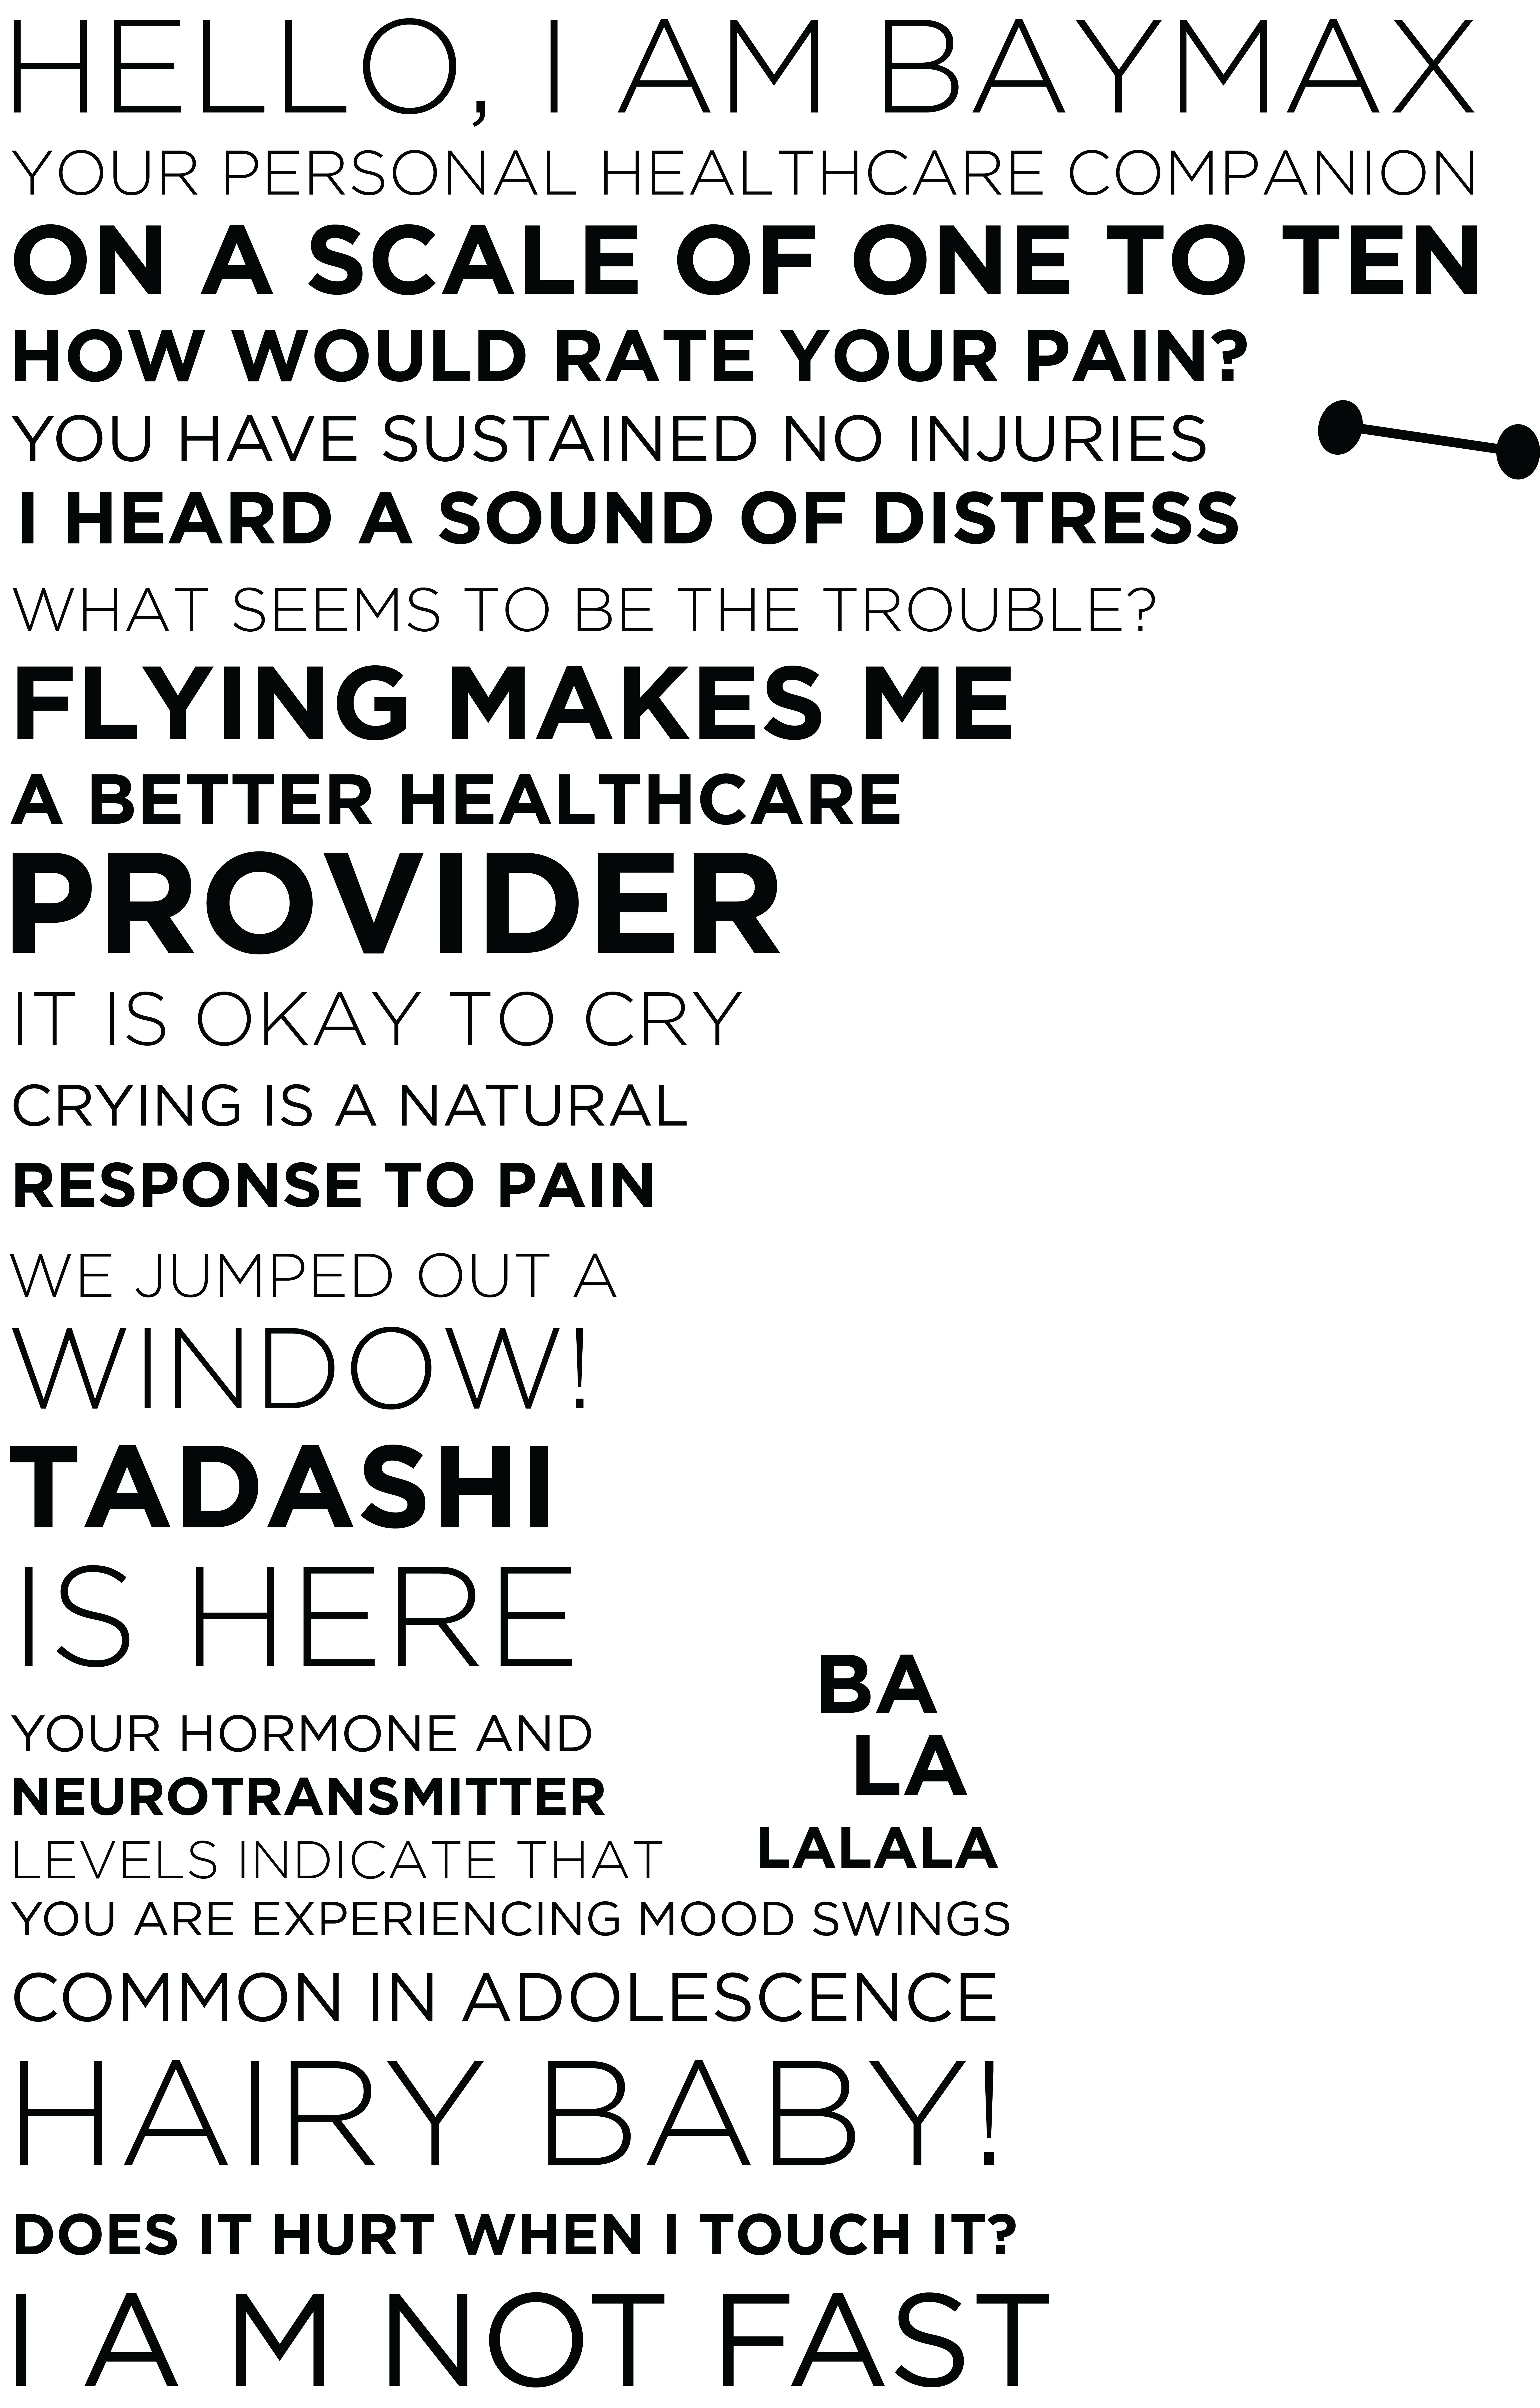 A minimalist poster of Baymax quotes from Disney's Big Hero 6. #Baymax #BigHero6 #Disney